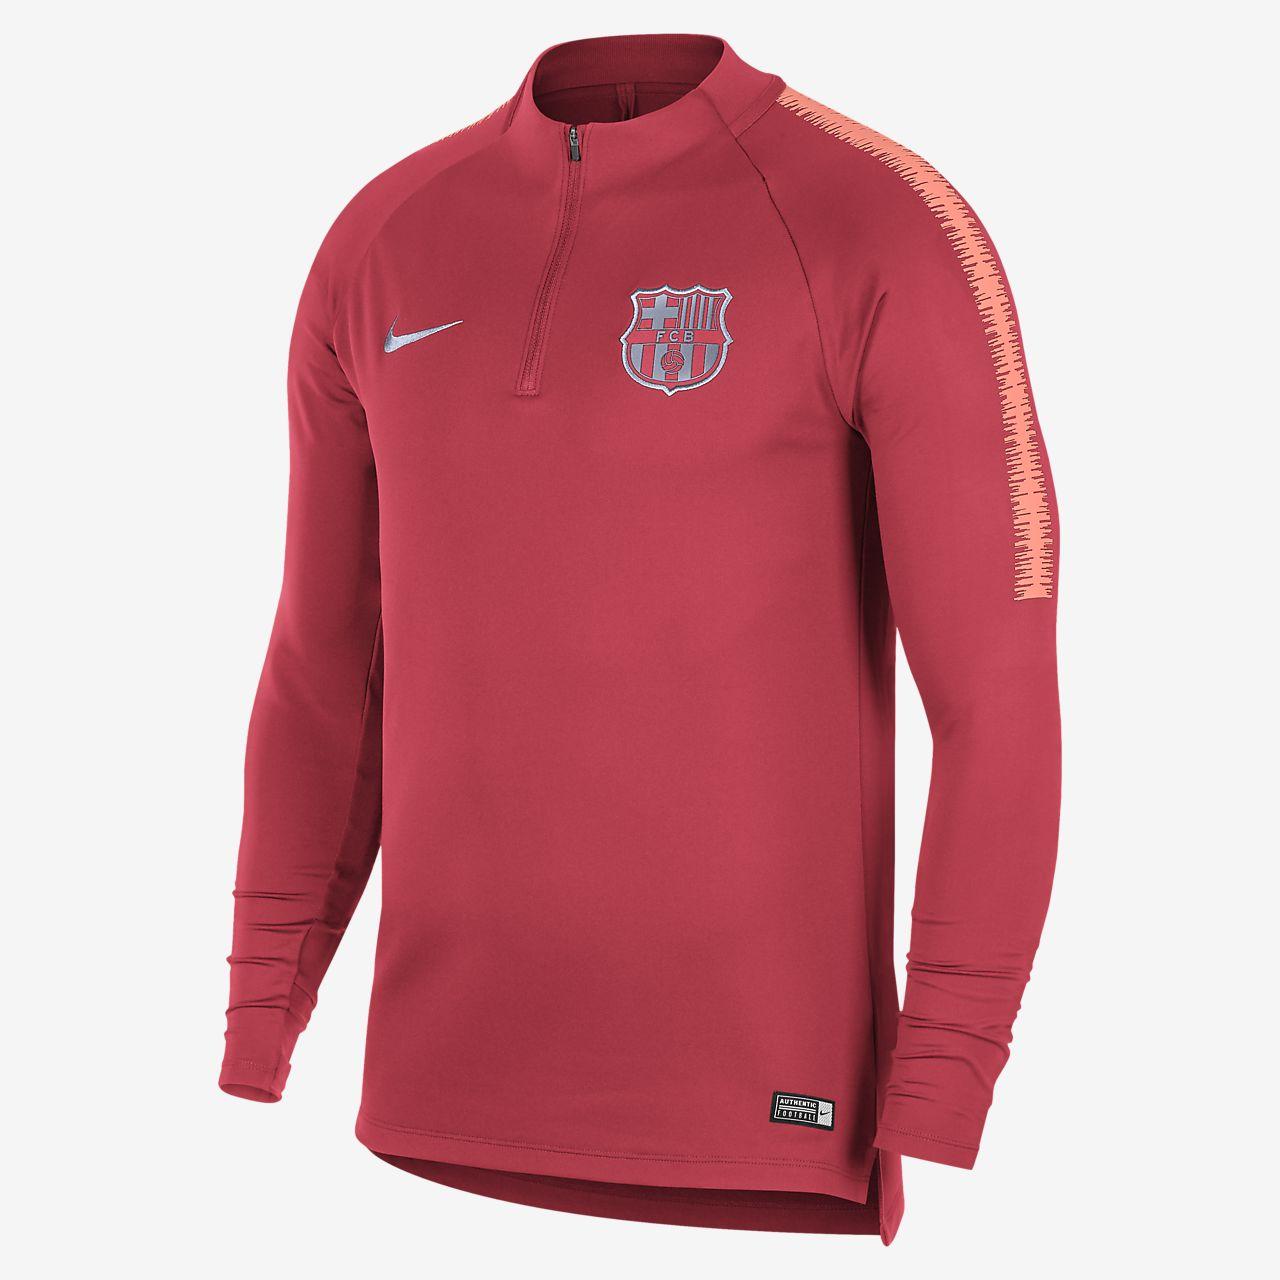 5aaf4ccb3 FC Barcelona Dri-FIT Squad Drill Men s Long Sleeve Soccer Top. Nike.com